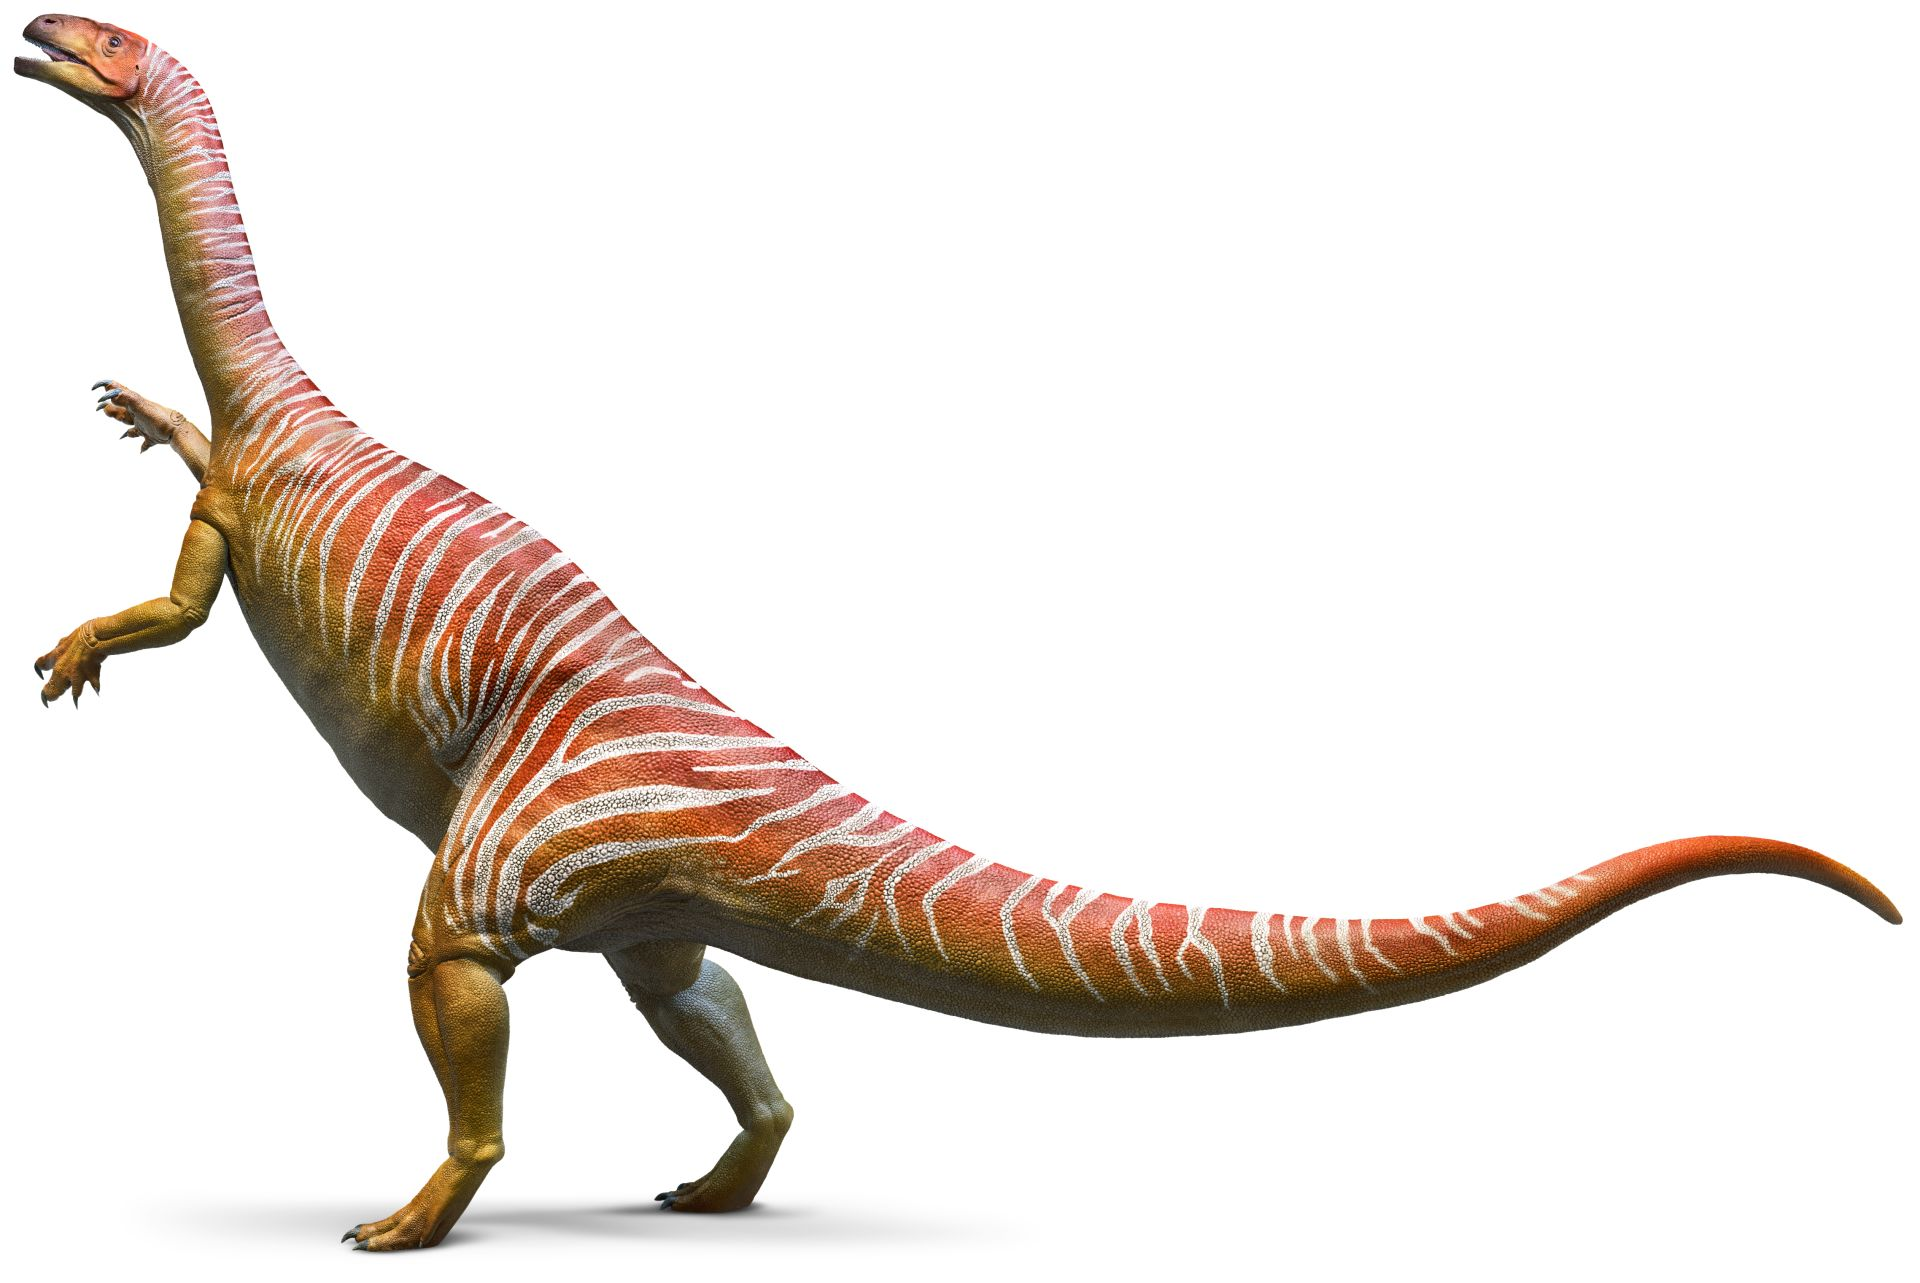 Plateosaurus_whole_bq2b8s.jpg